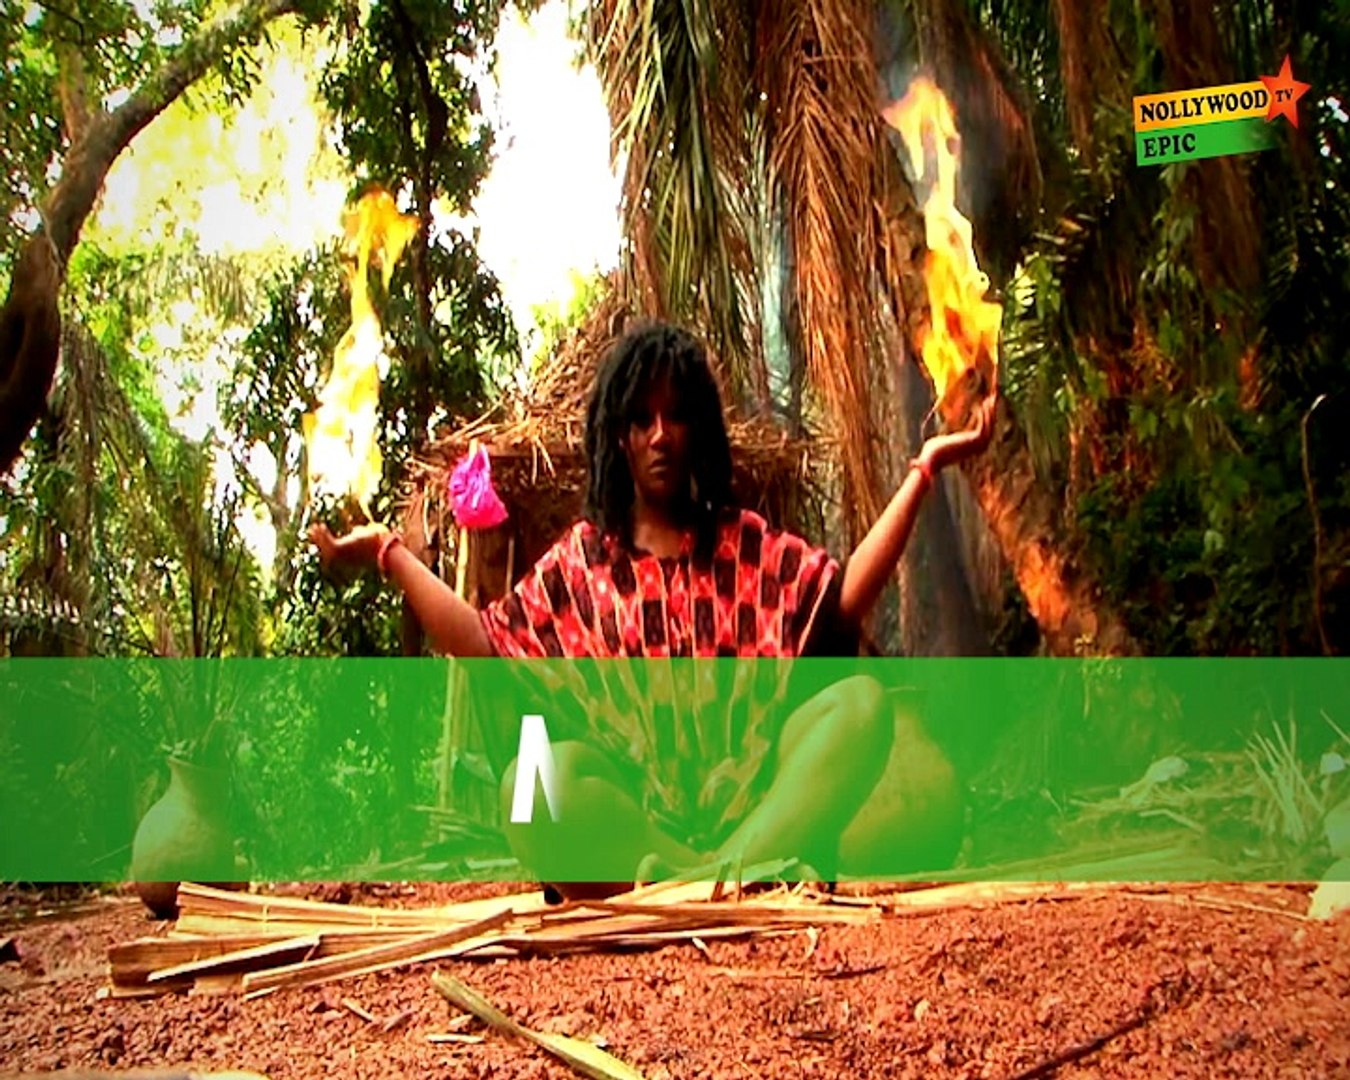 Nollywood TV EPIC